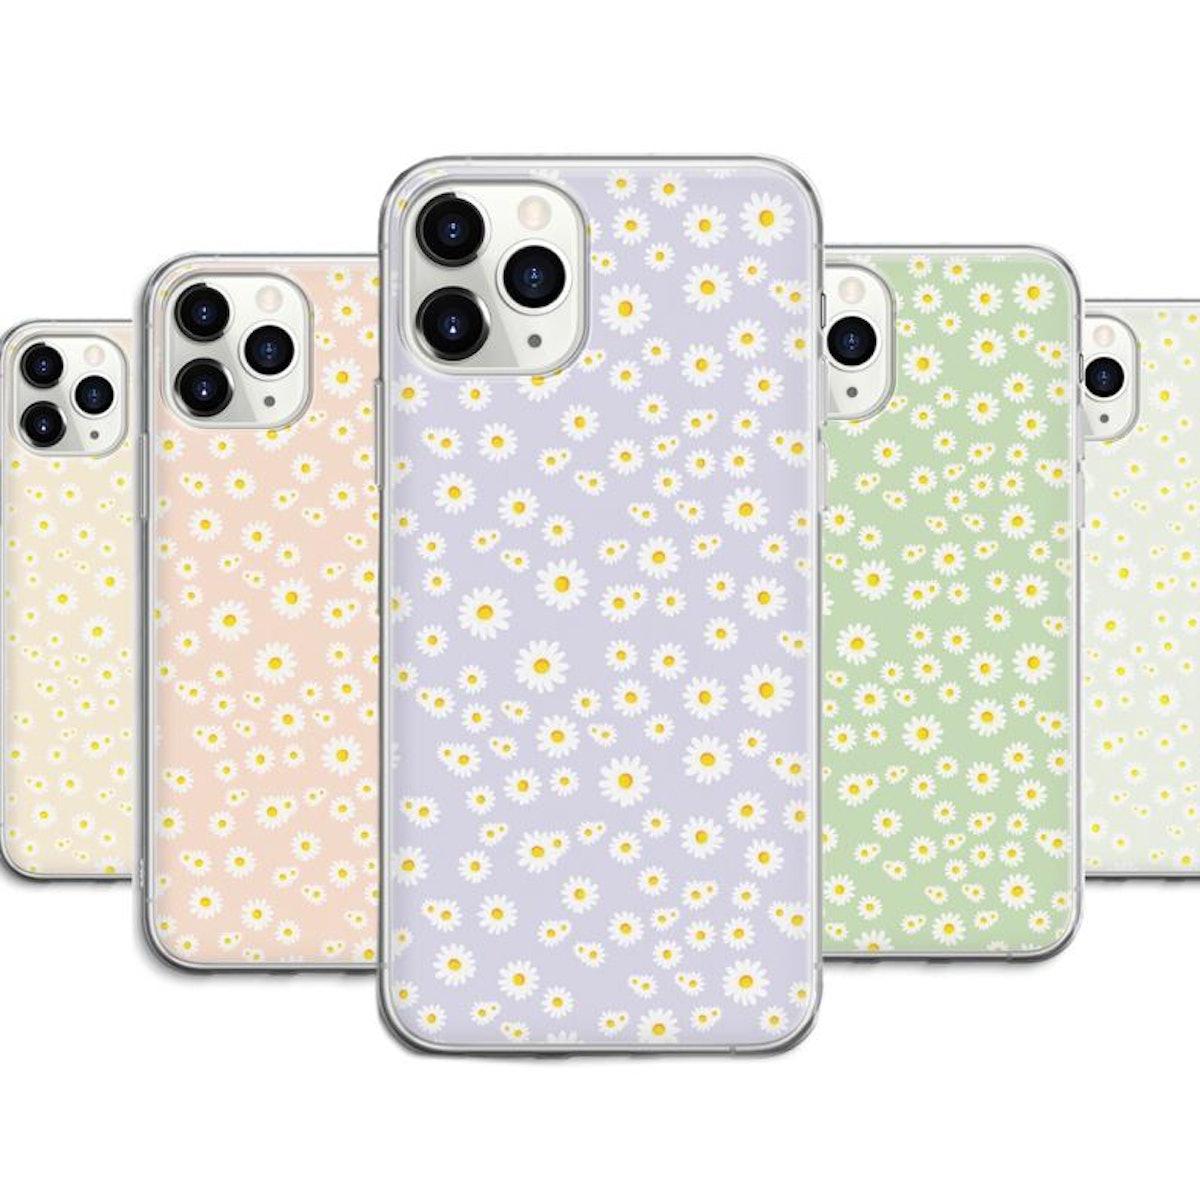 Daisy iPhone 12 Mini Case